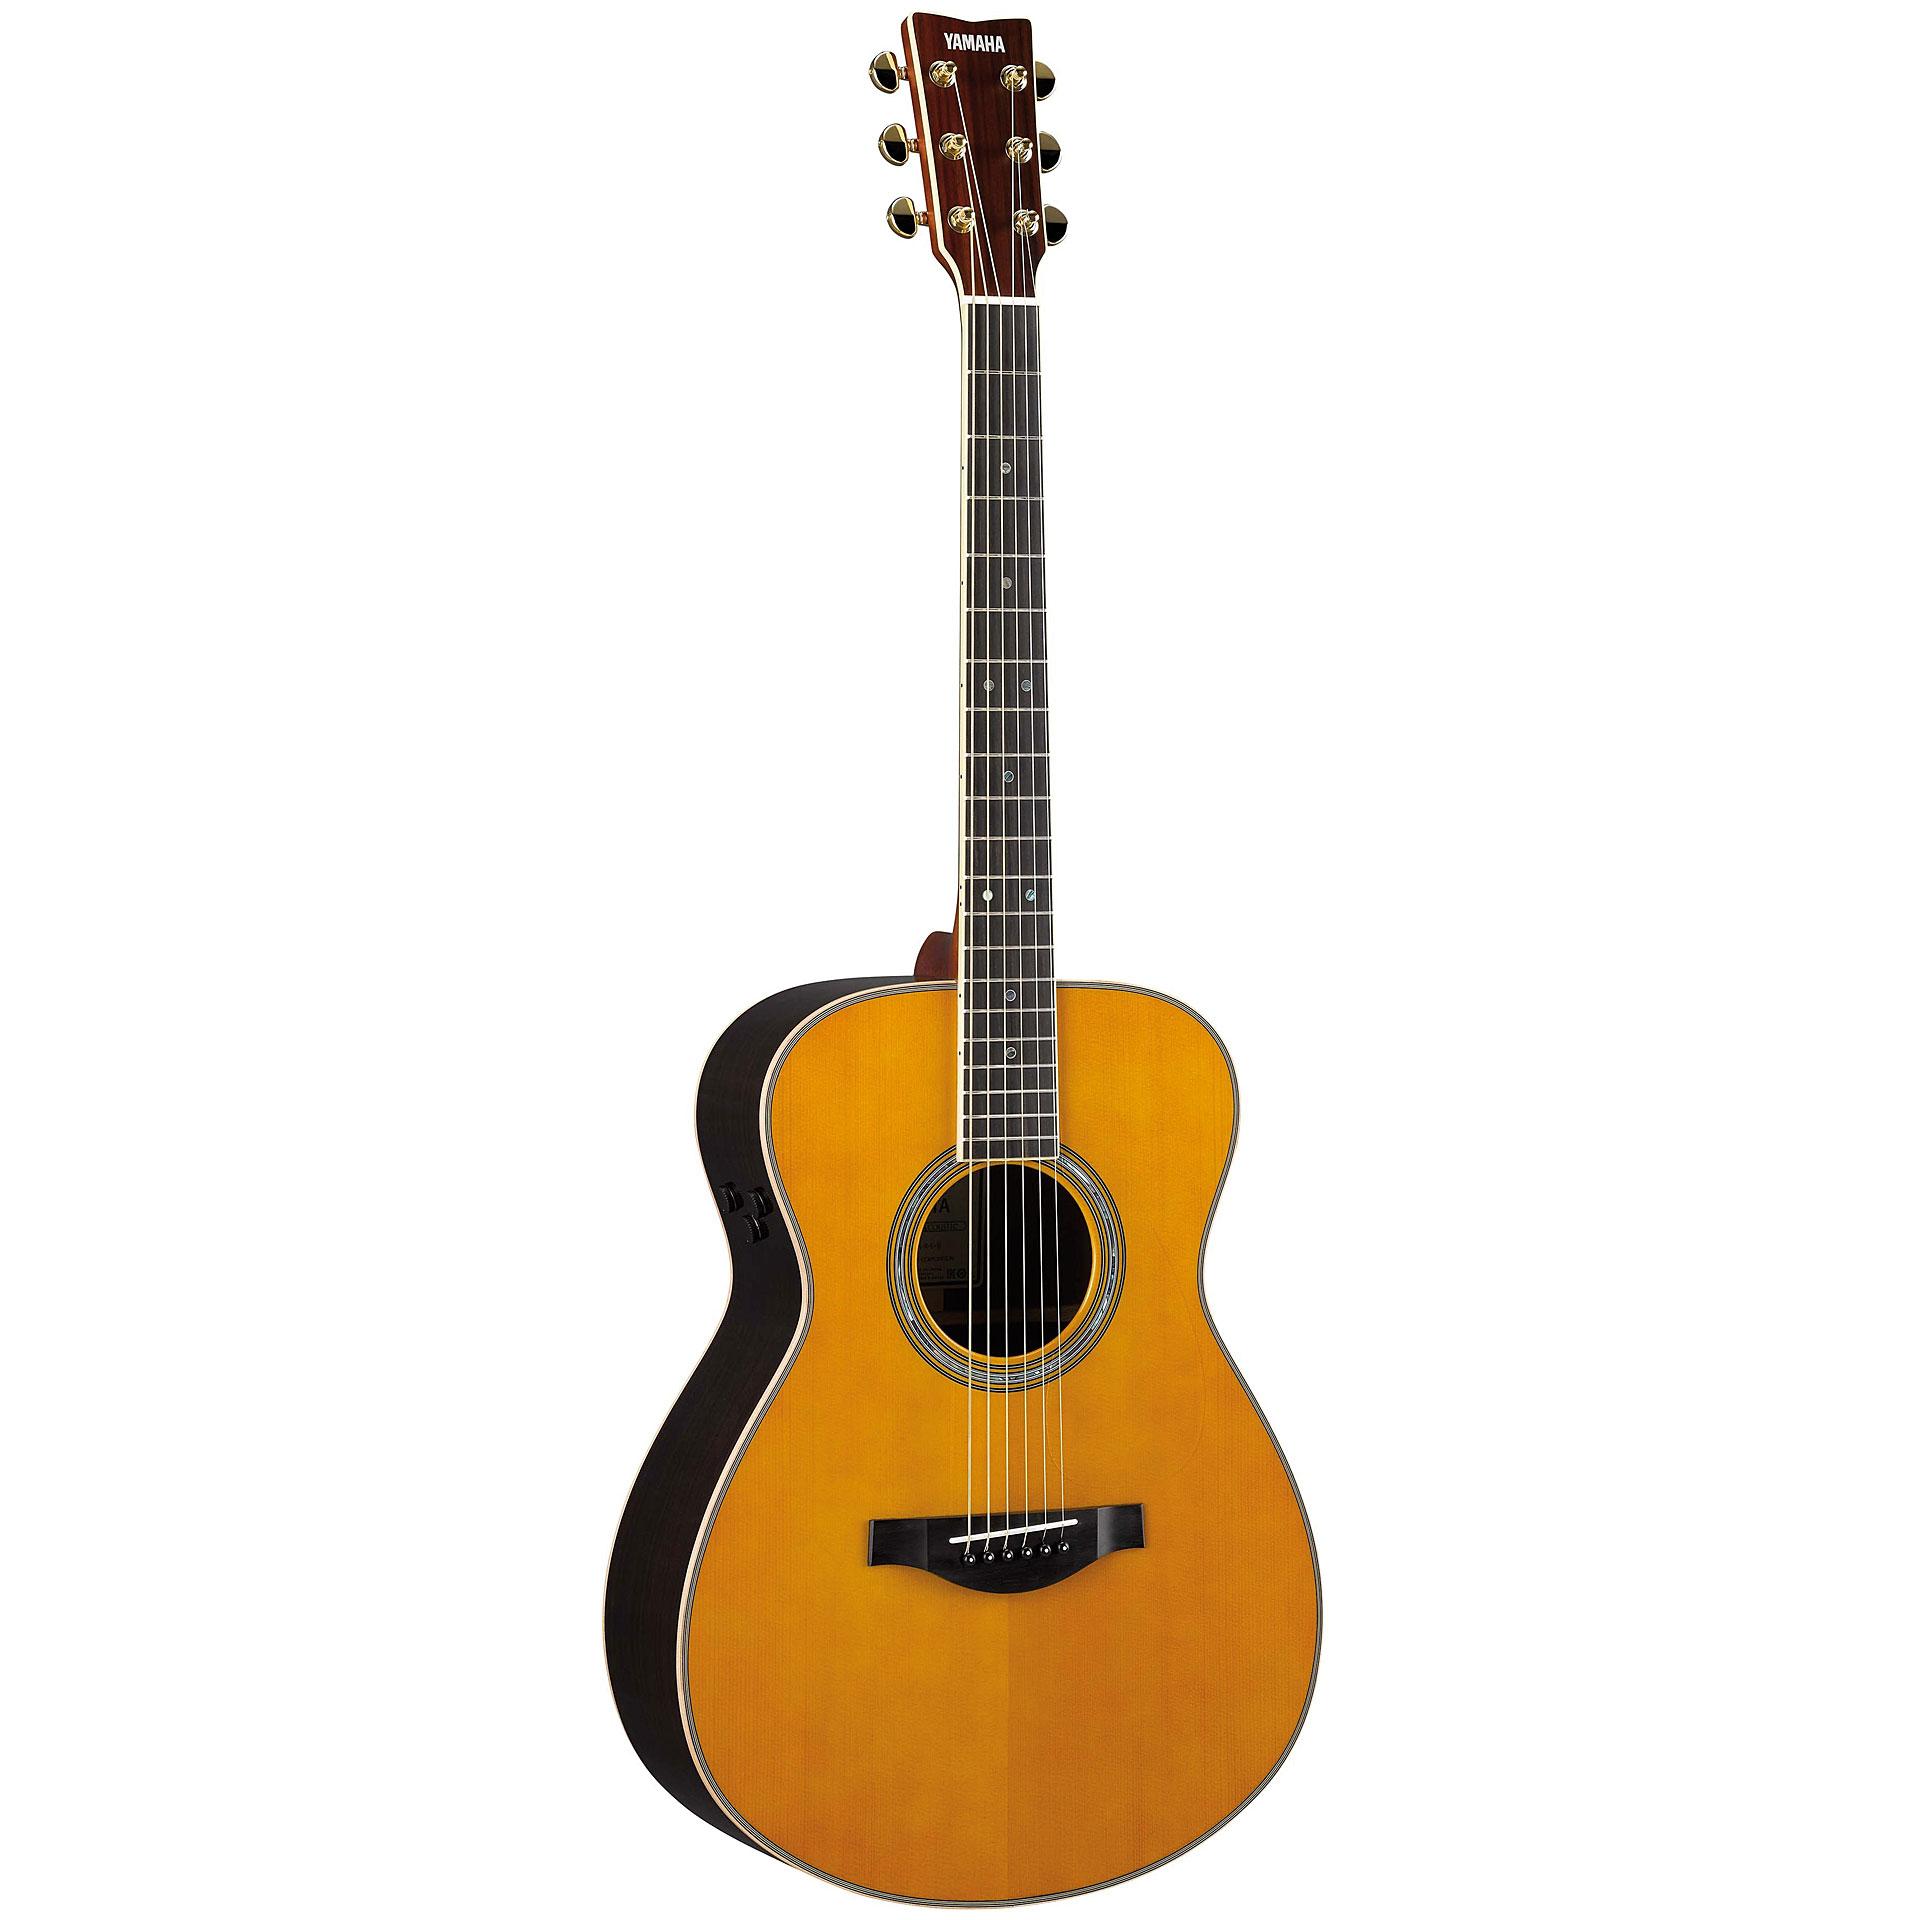 Yamaha ls ta acoustic guitar for Yamaha ls ta